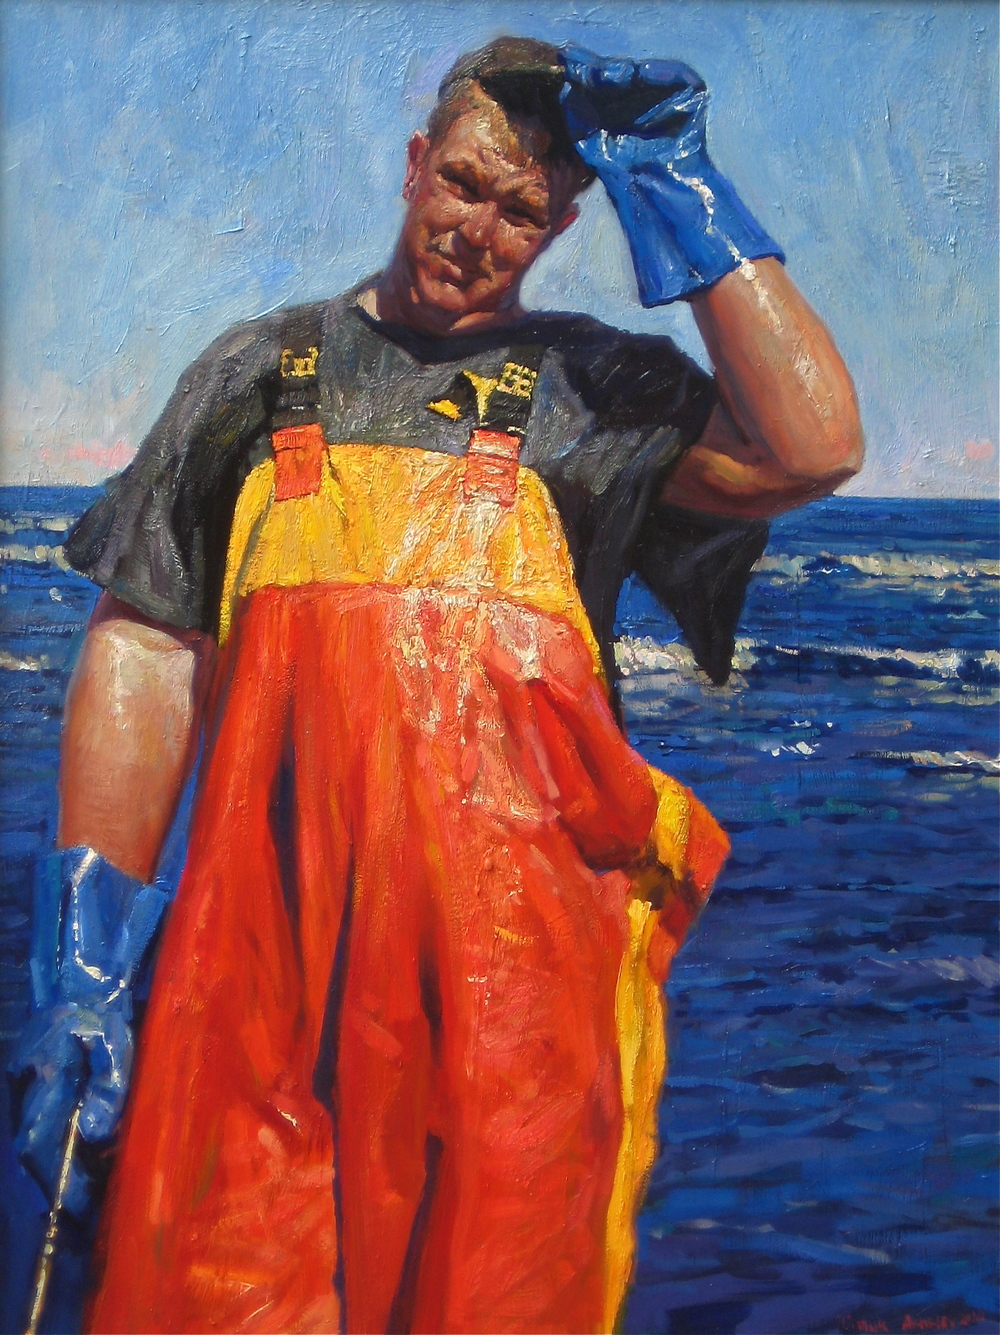 "Timur Akhriev  Title:Work Day 18"" X 24"" Oil on Board. 2010. Sold."